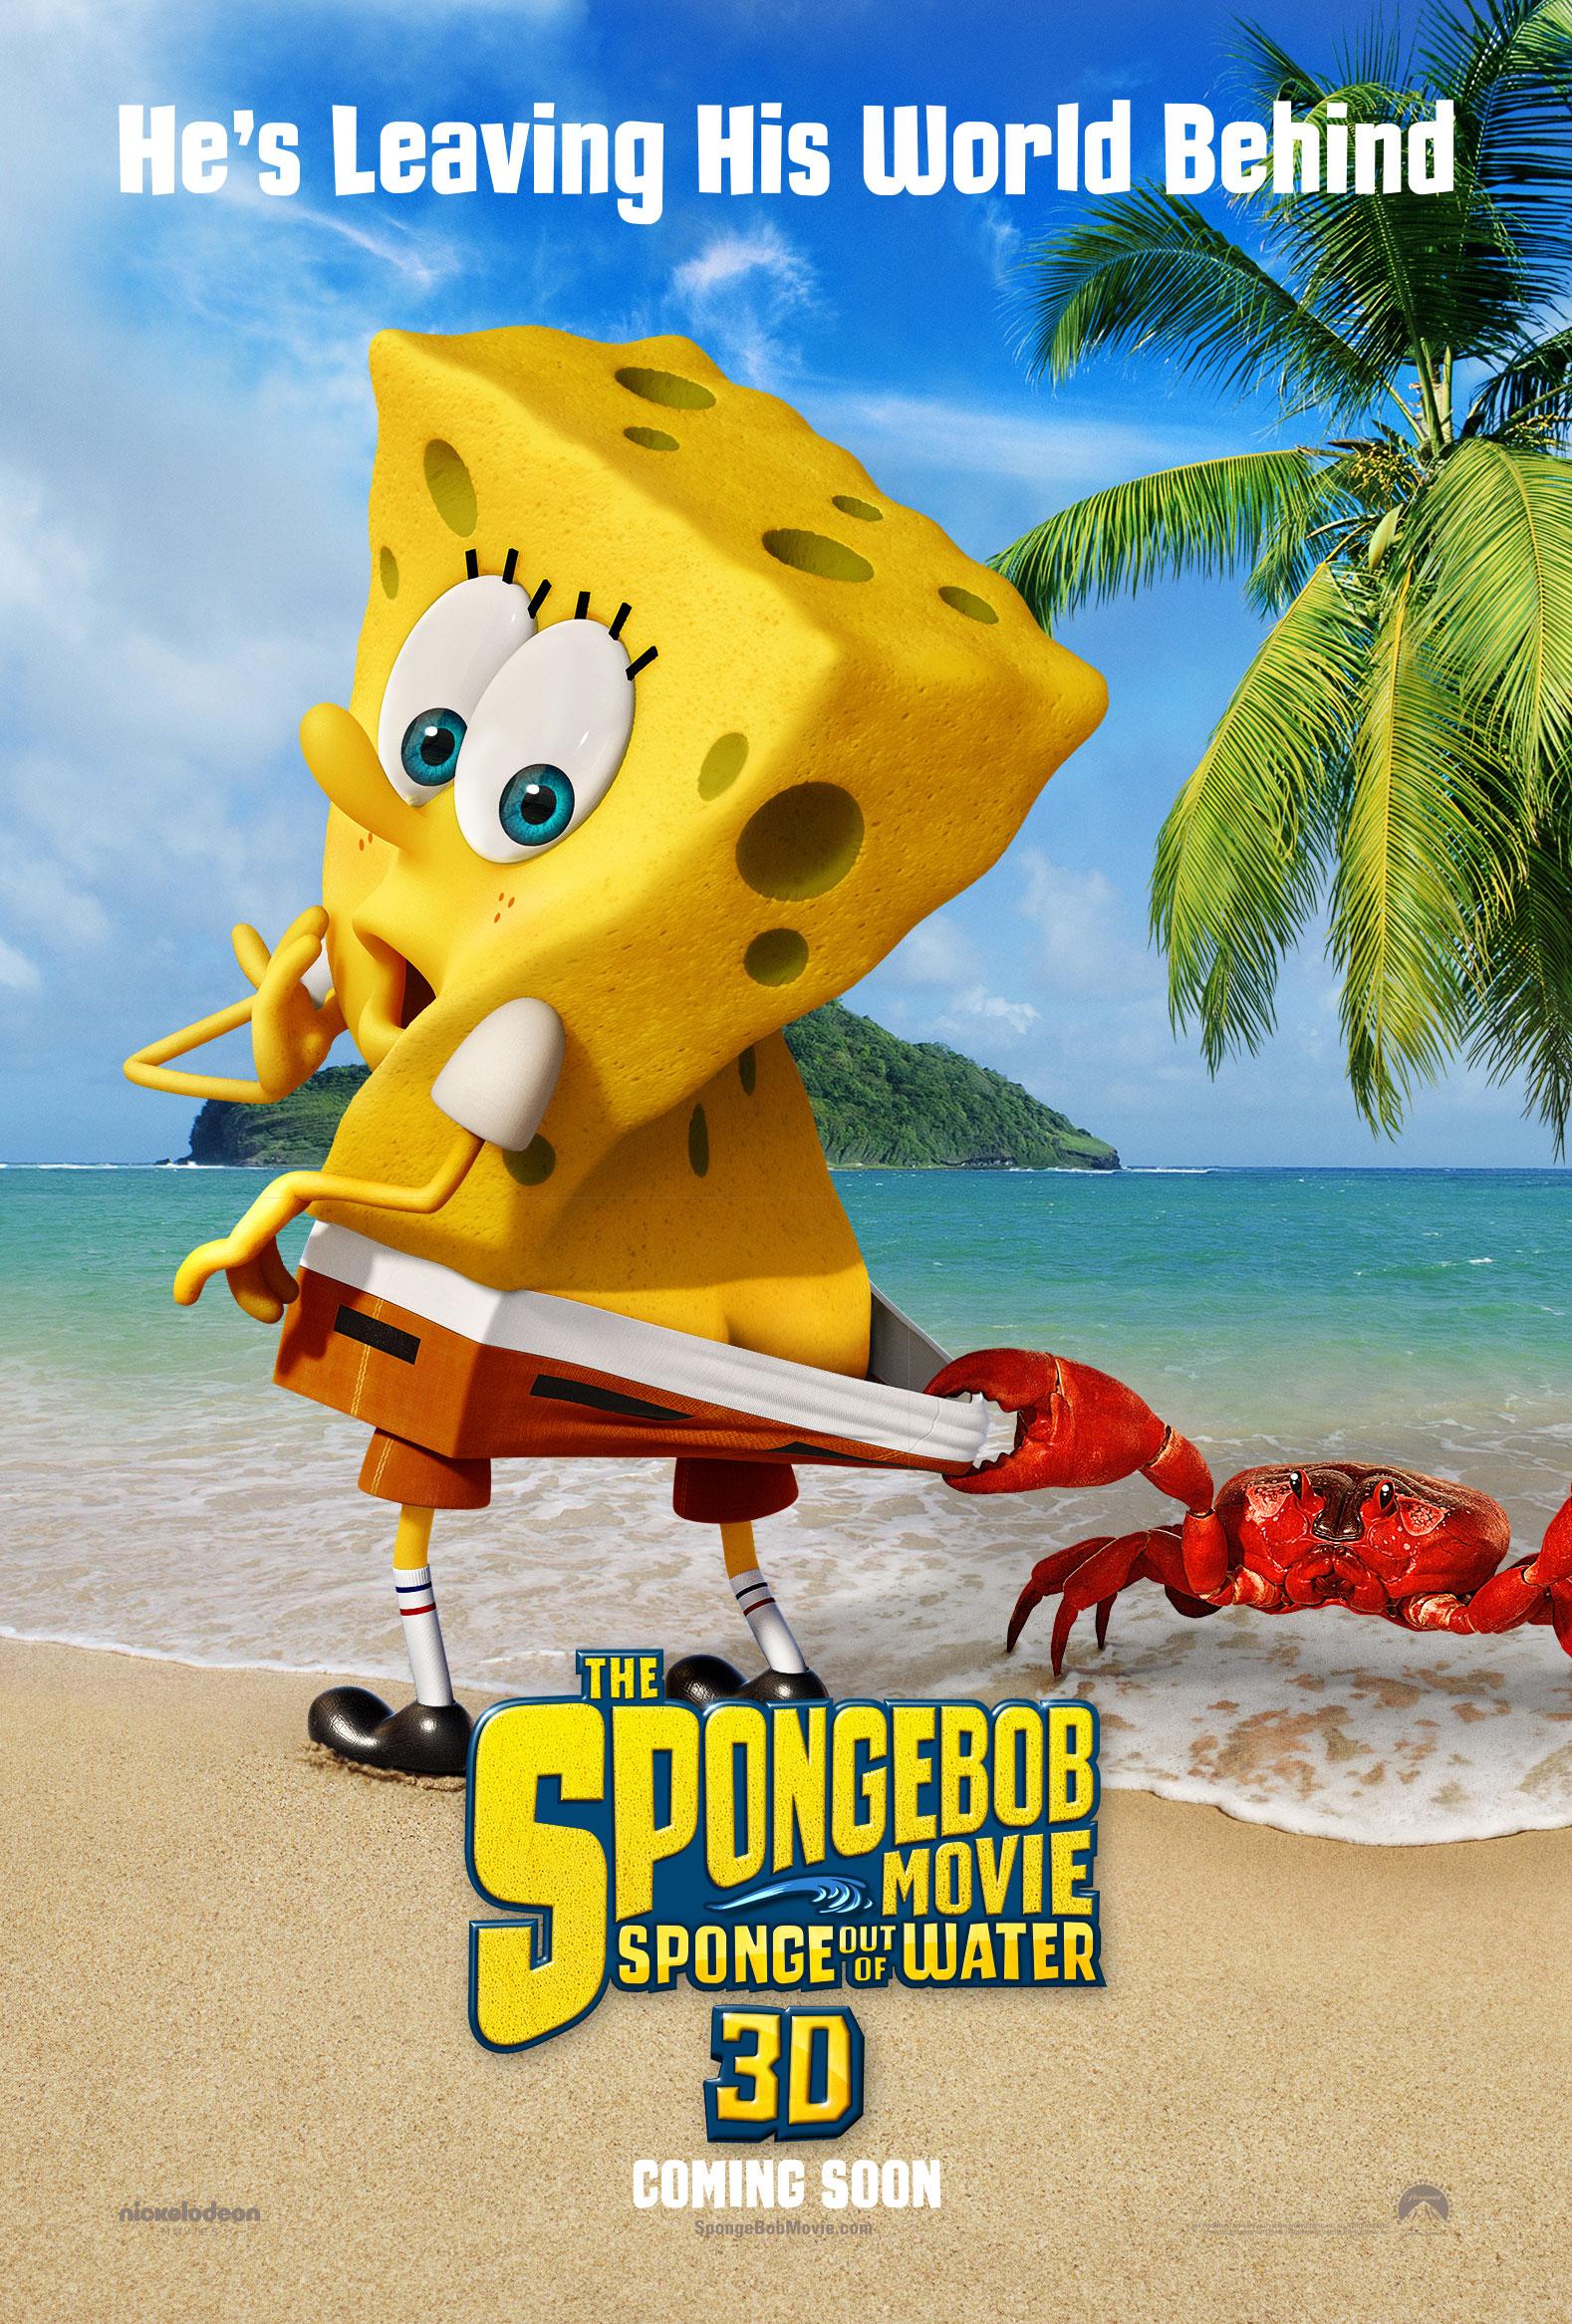 win with emnotweni and spongebob squarepants lowvelder